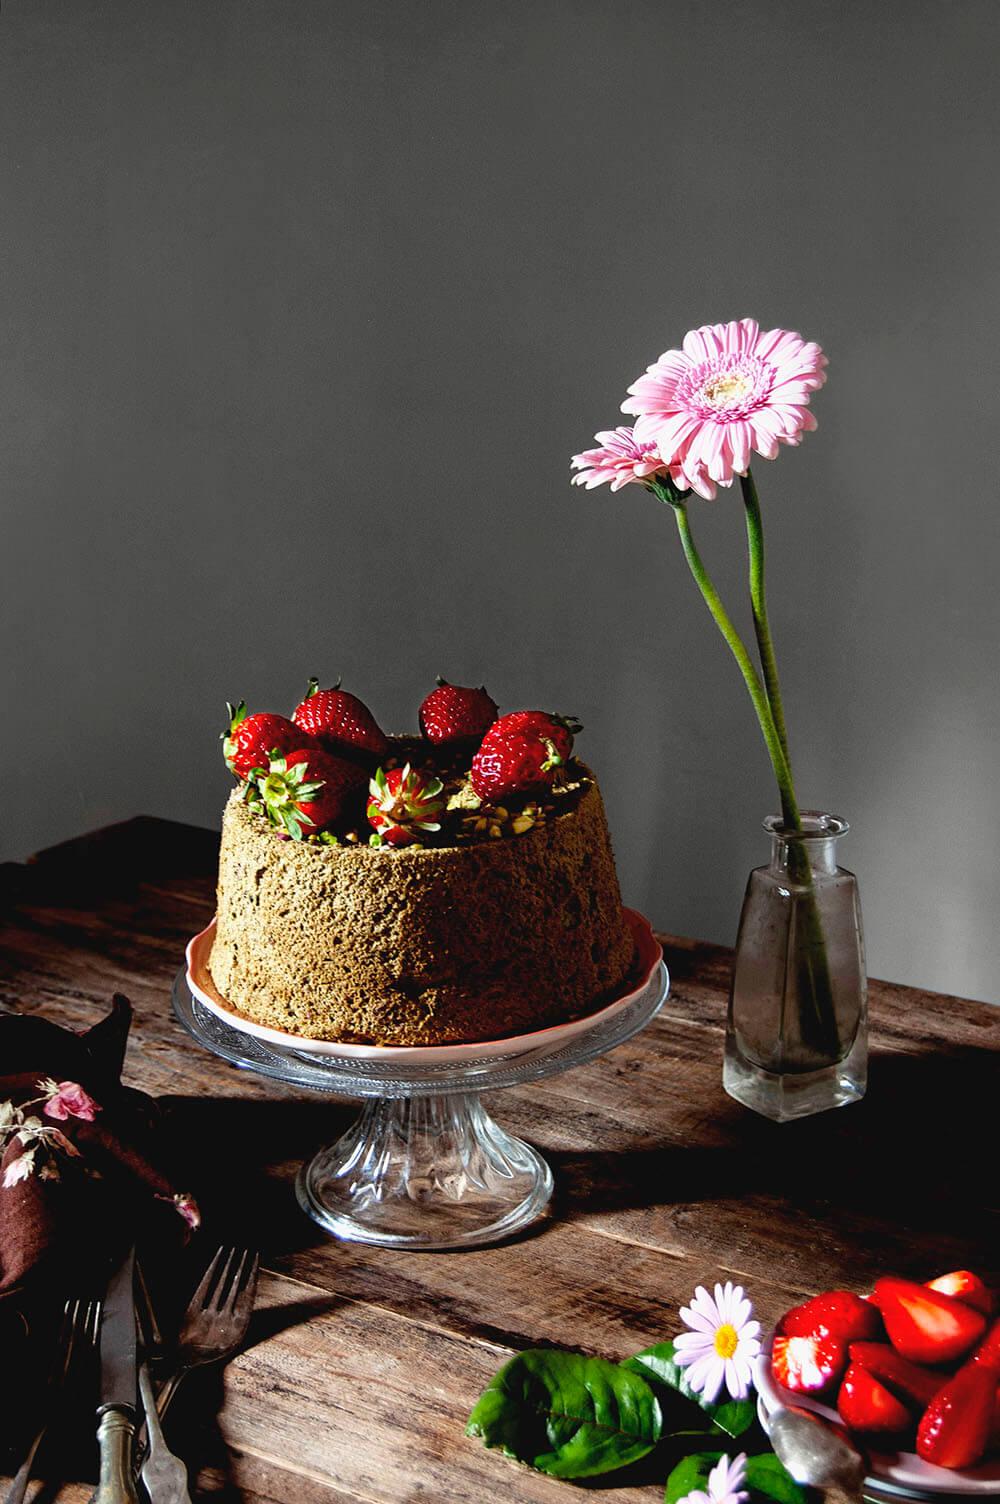 receta de angel food cake de te matcha y pistacho